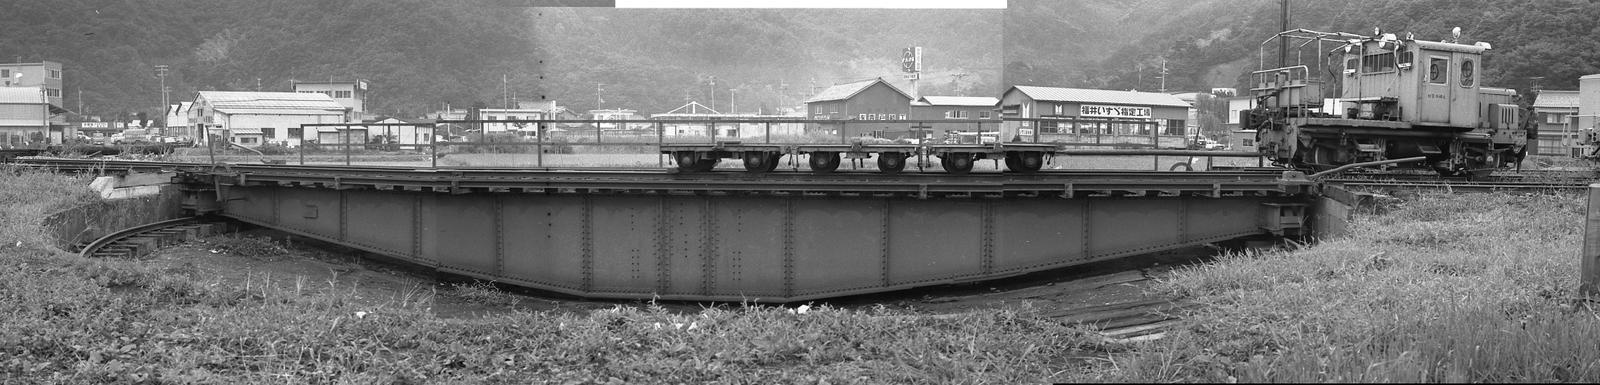 19790825e